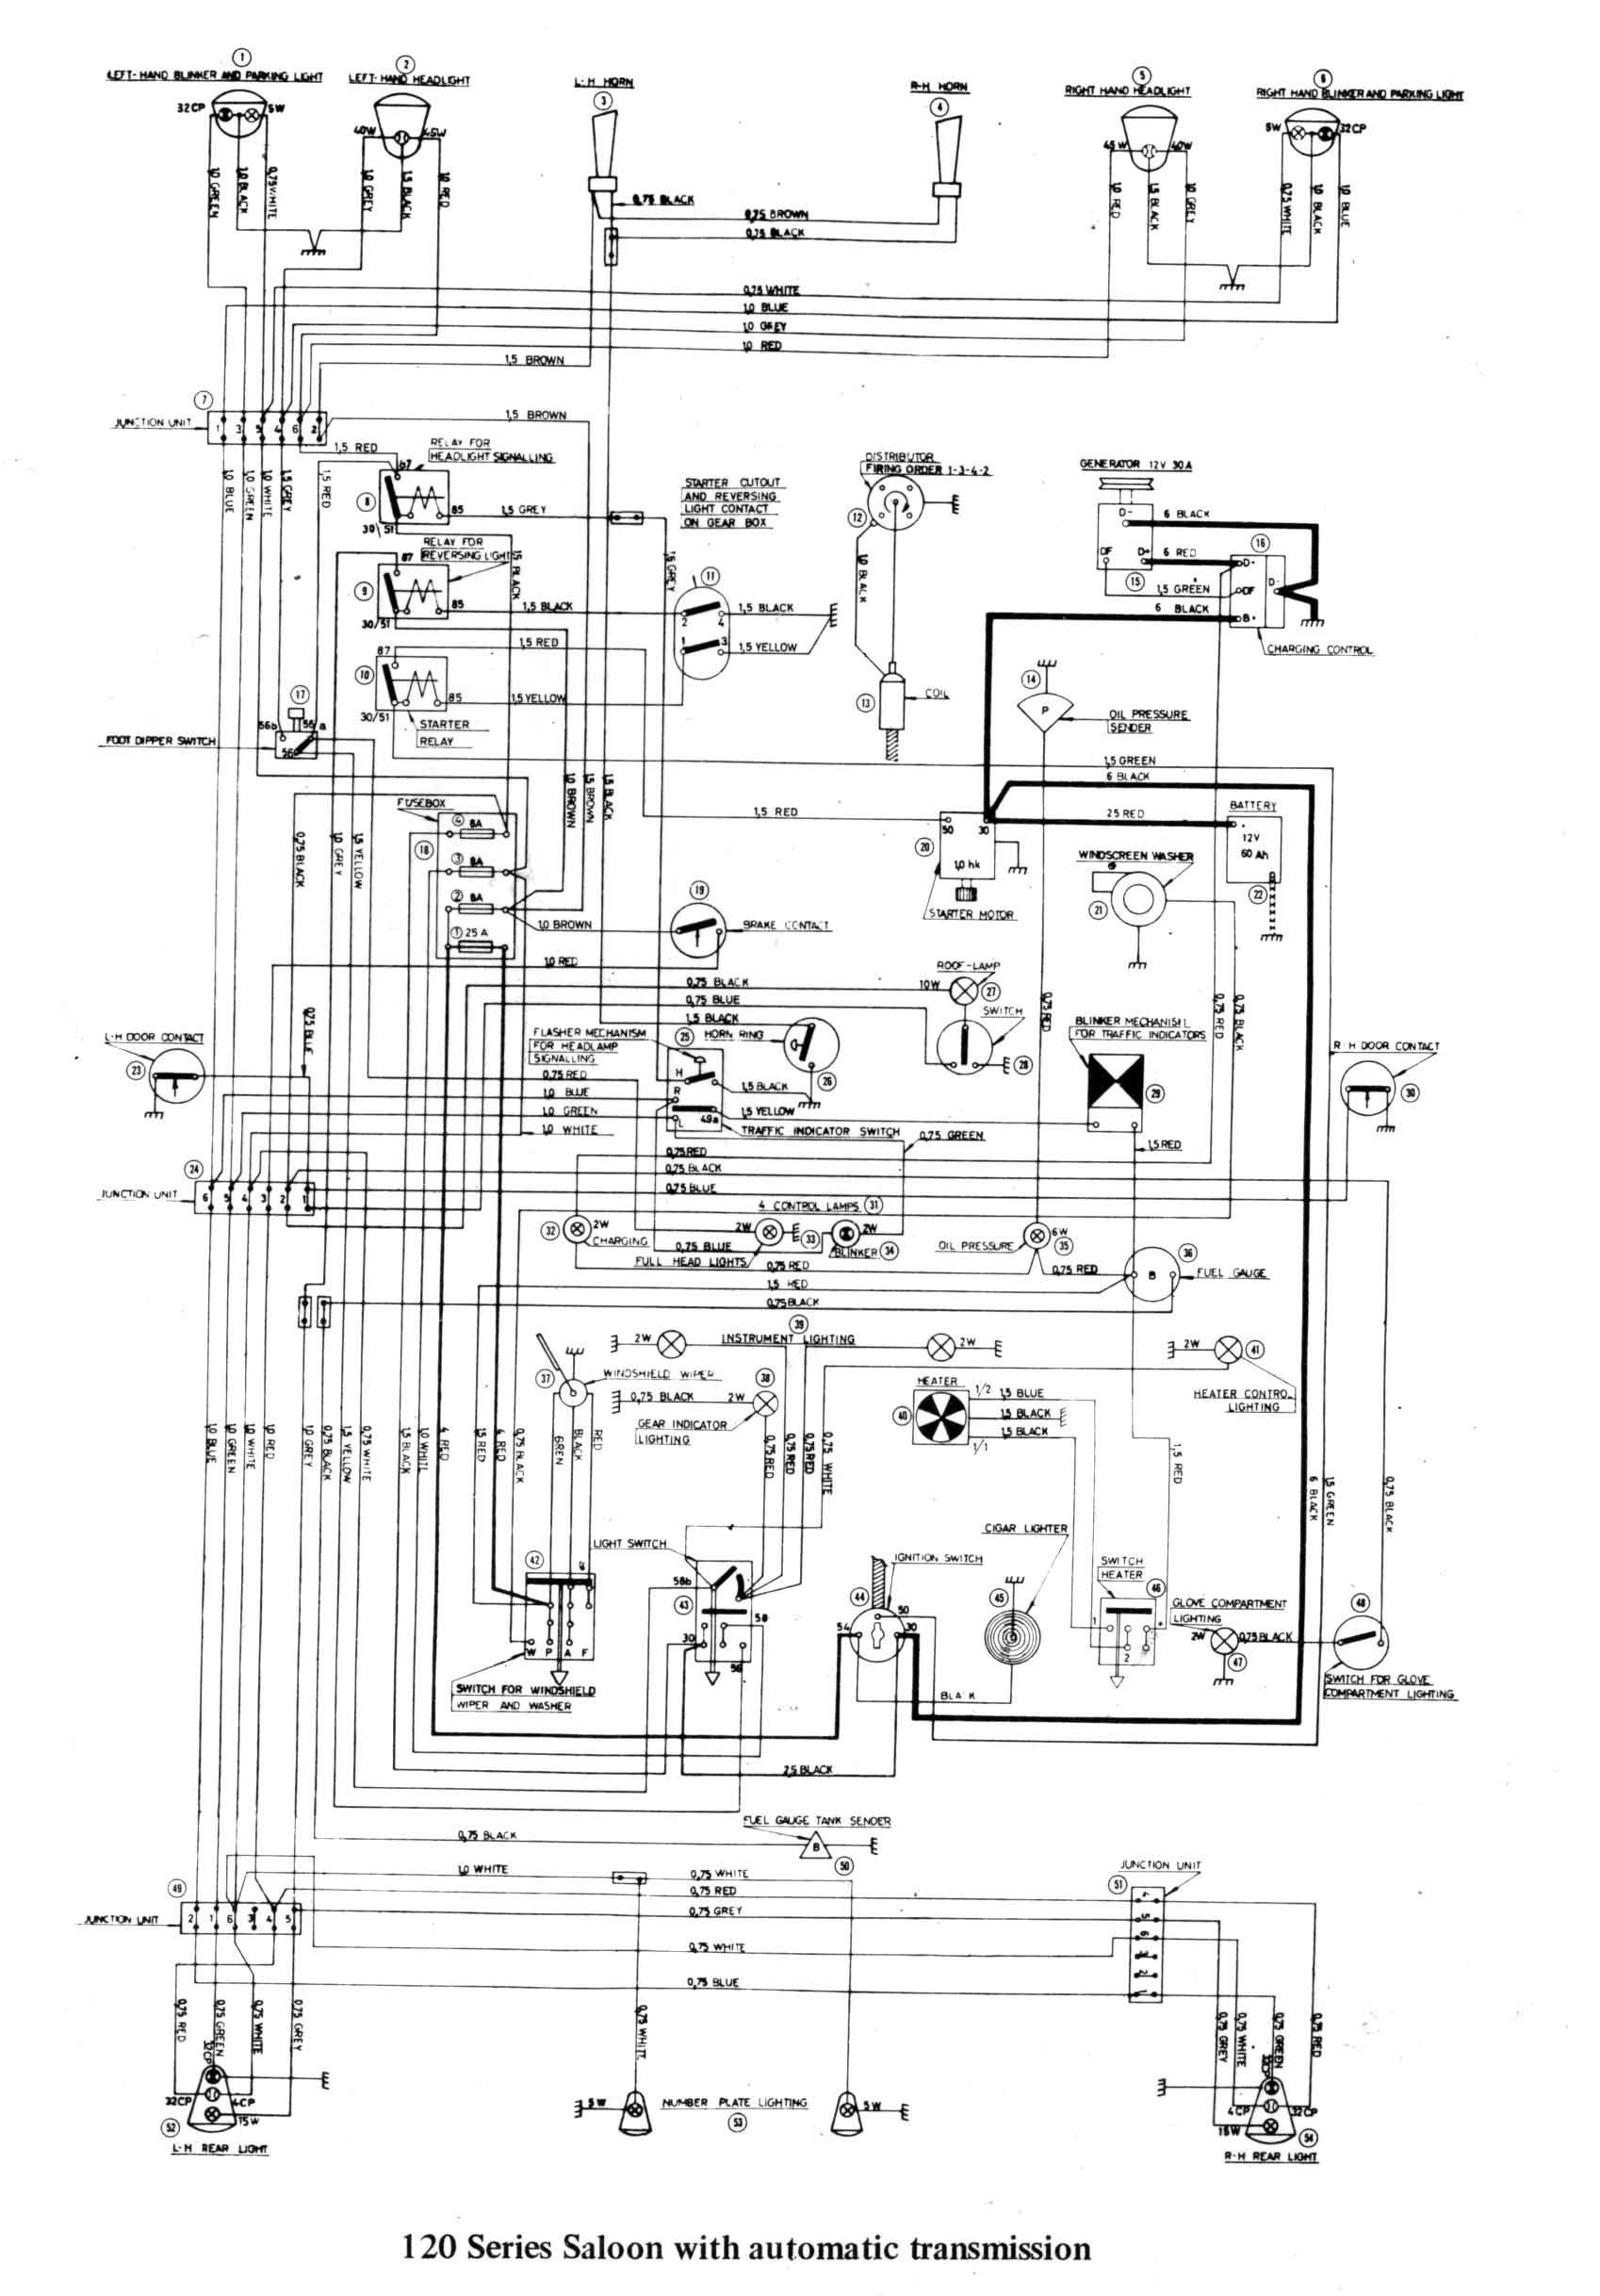 hight resolution of 2011 ford fiesta engine diagram 2006 ford focus engine diagram 2011 rh detoxicrecenze com 2006 ford